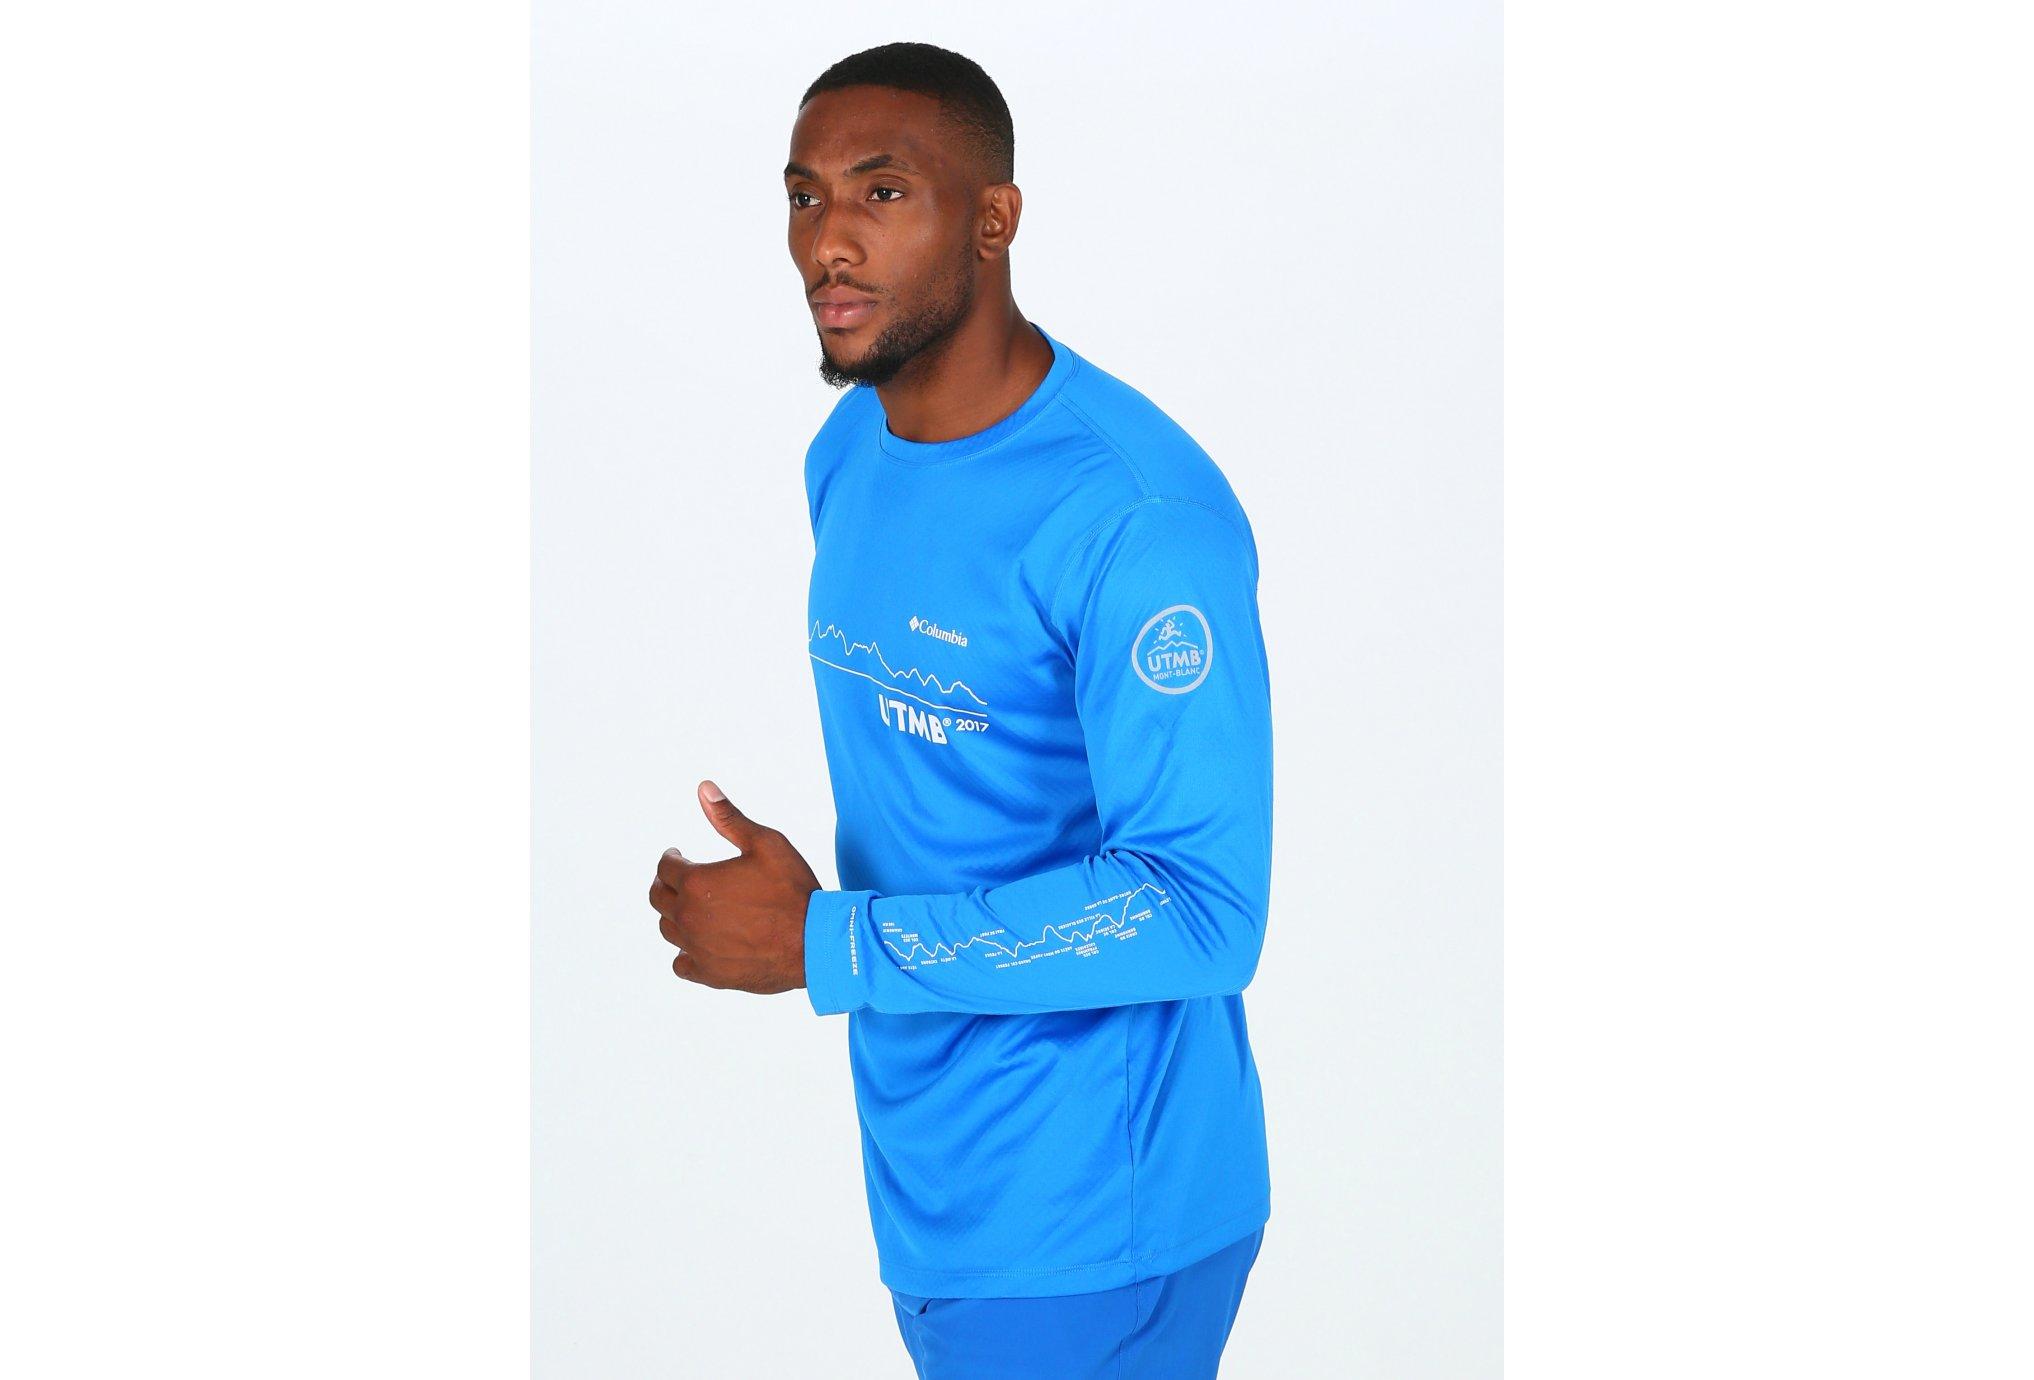 Columbia Zero Rules II UTMB® M Diététique Vêtements homme